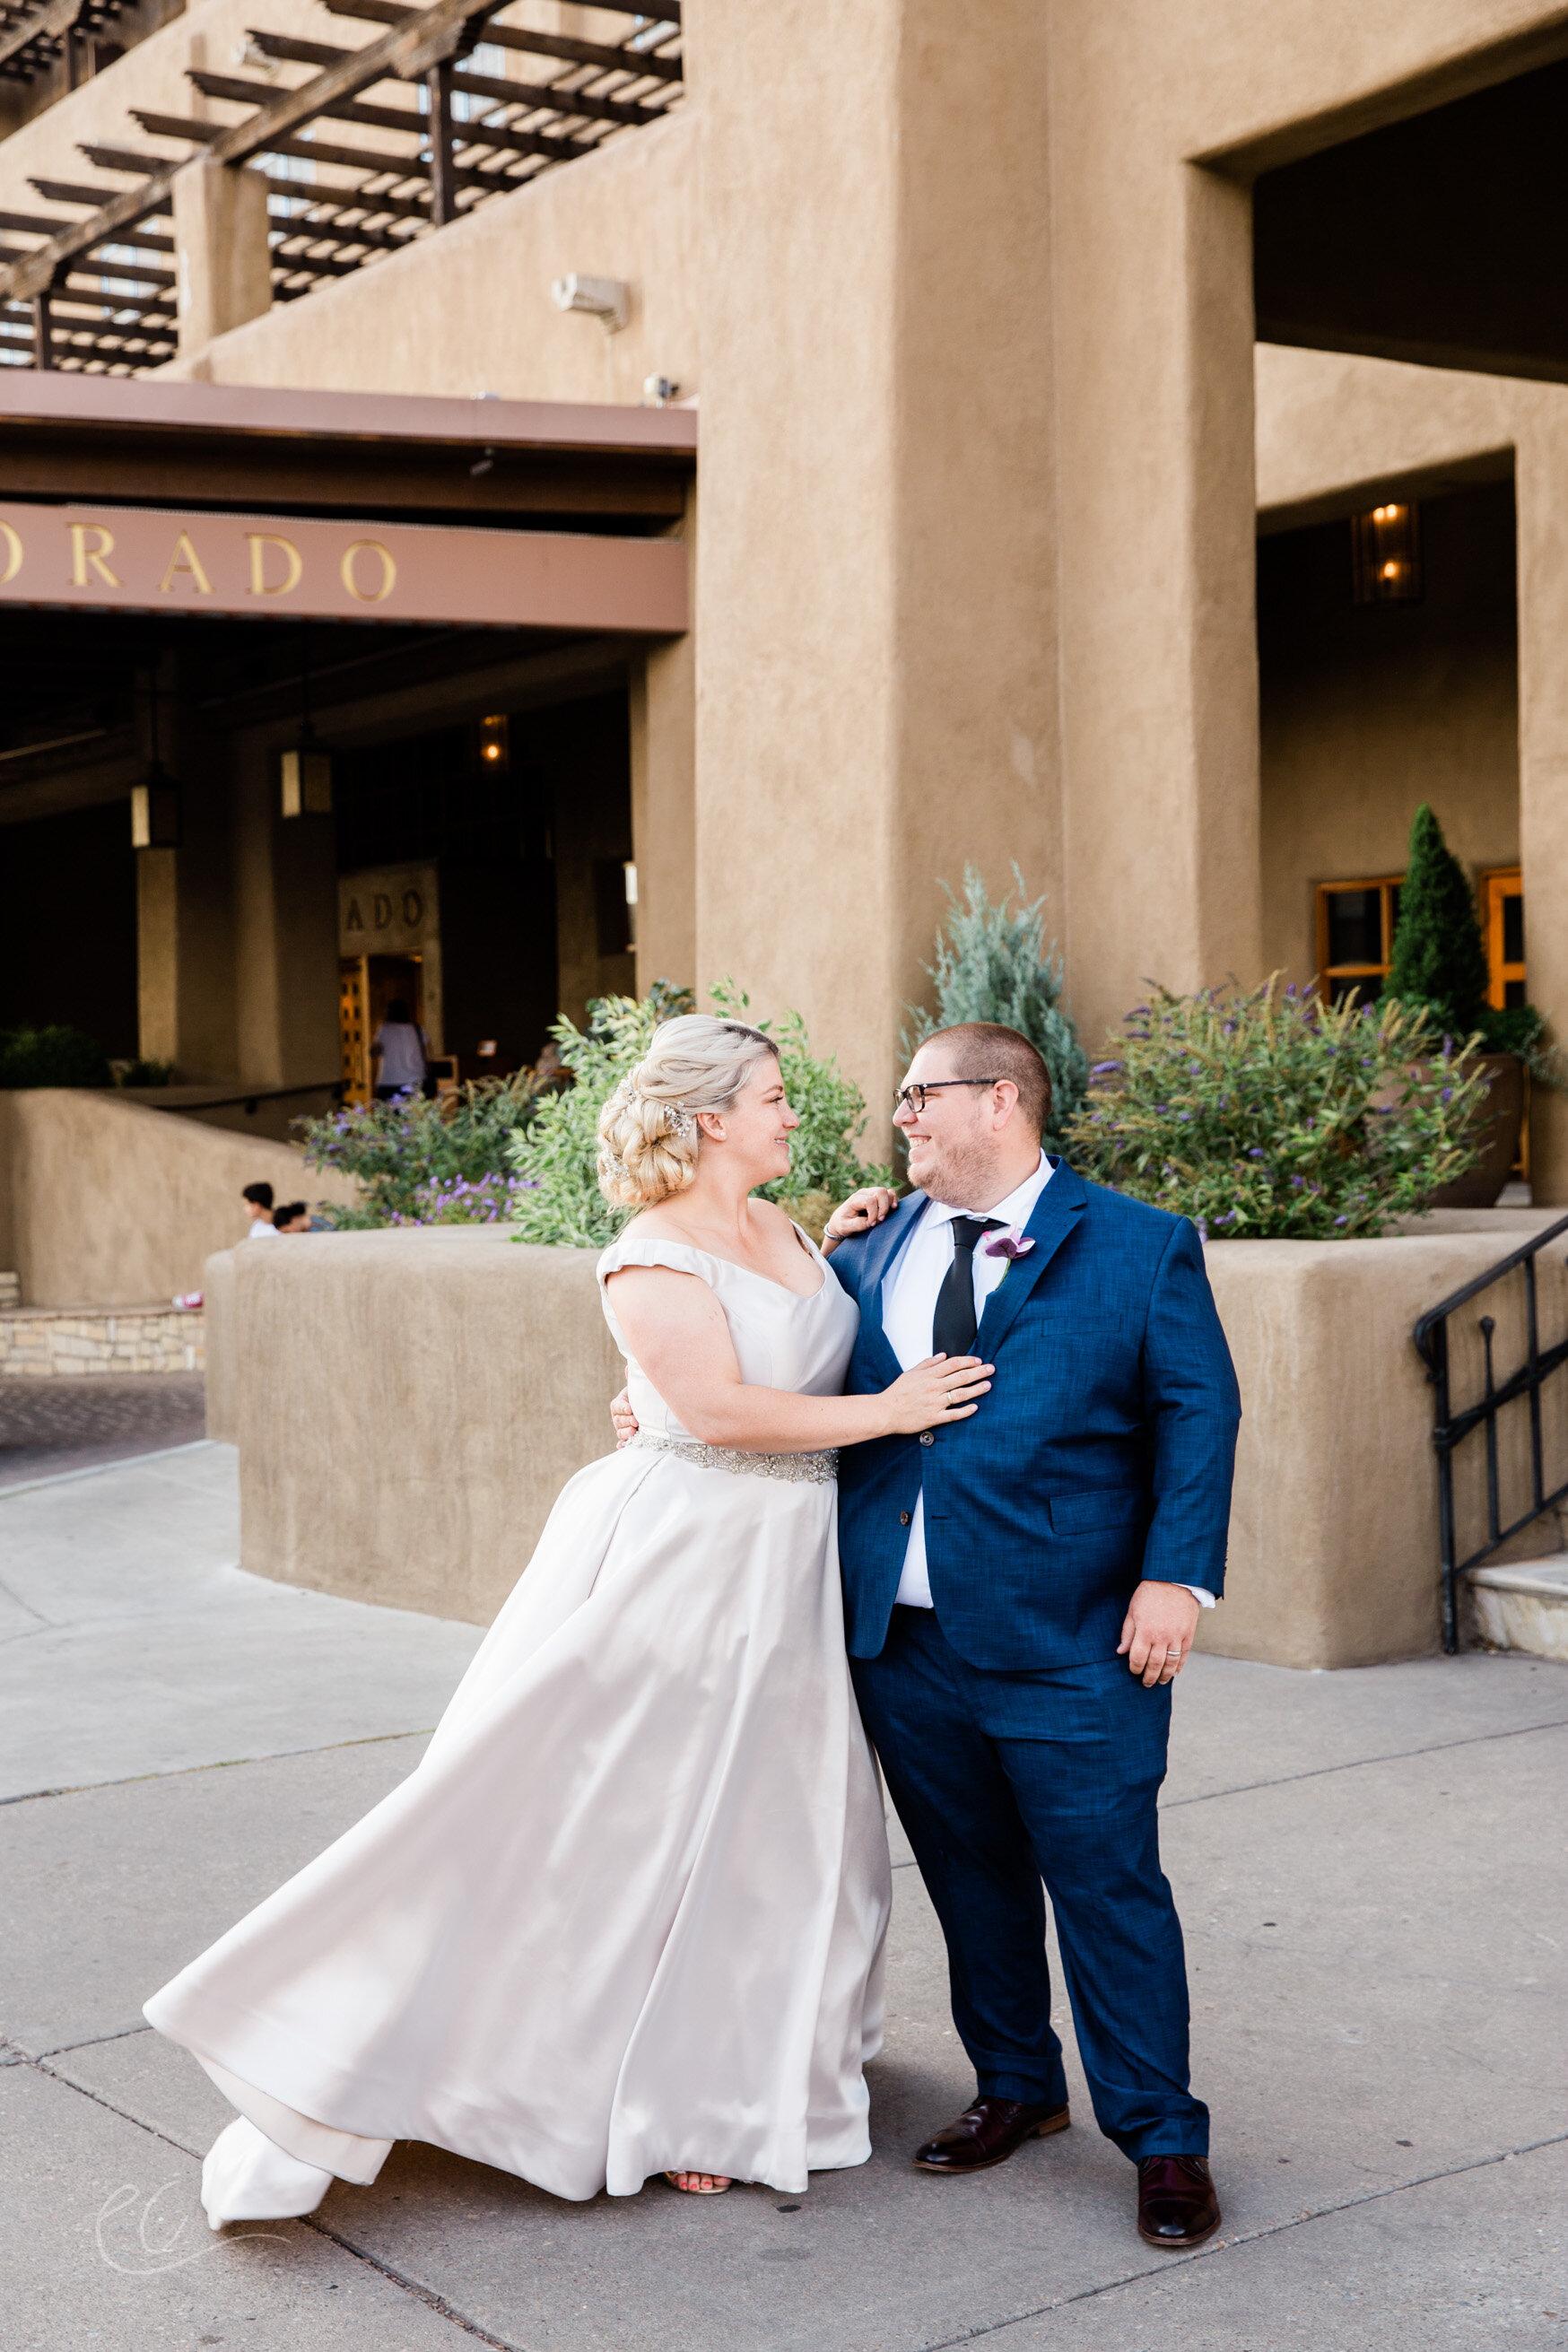 Santafe_wedding_photography_kellyzac-53.jpg